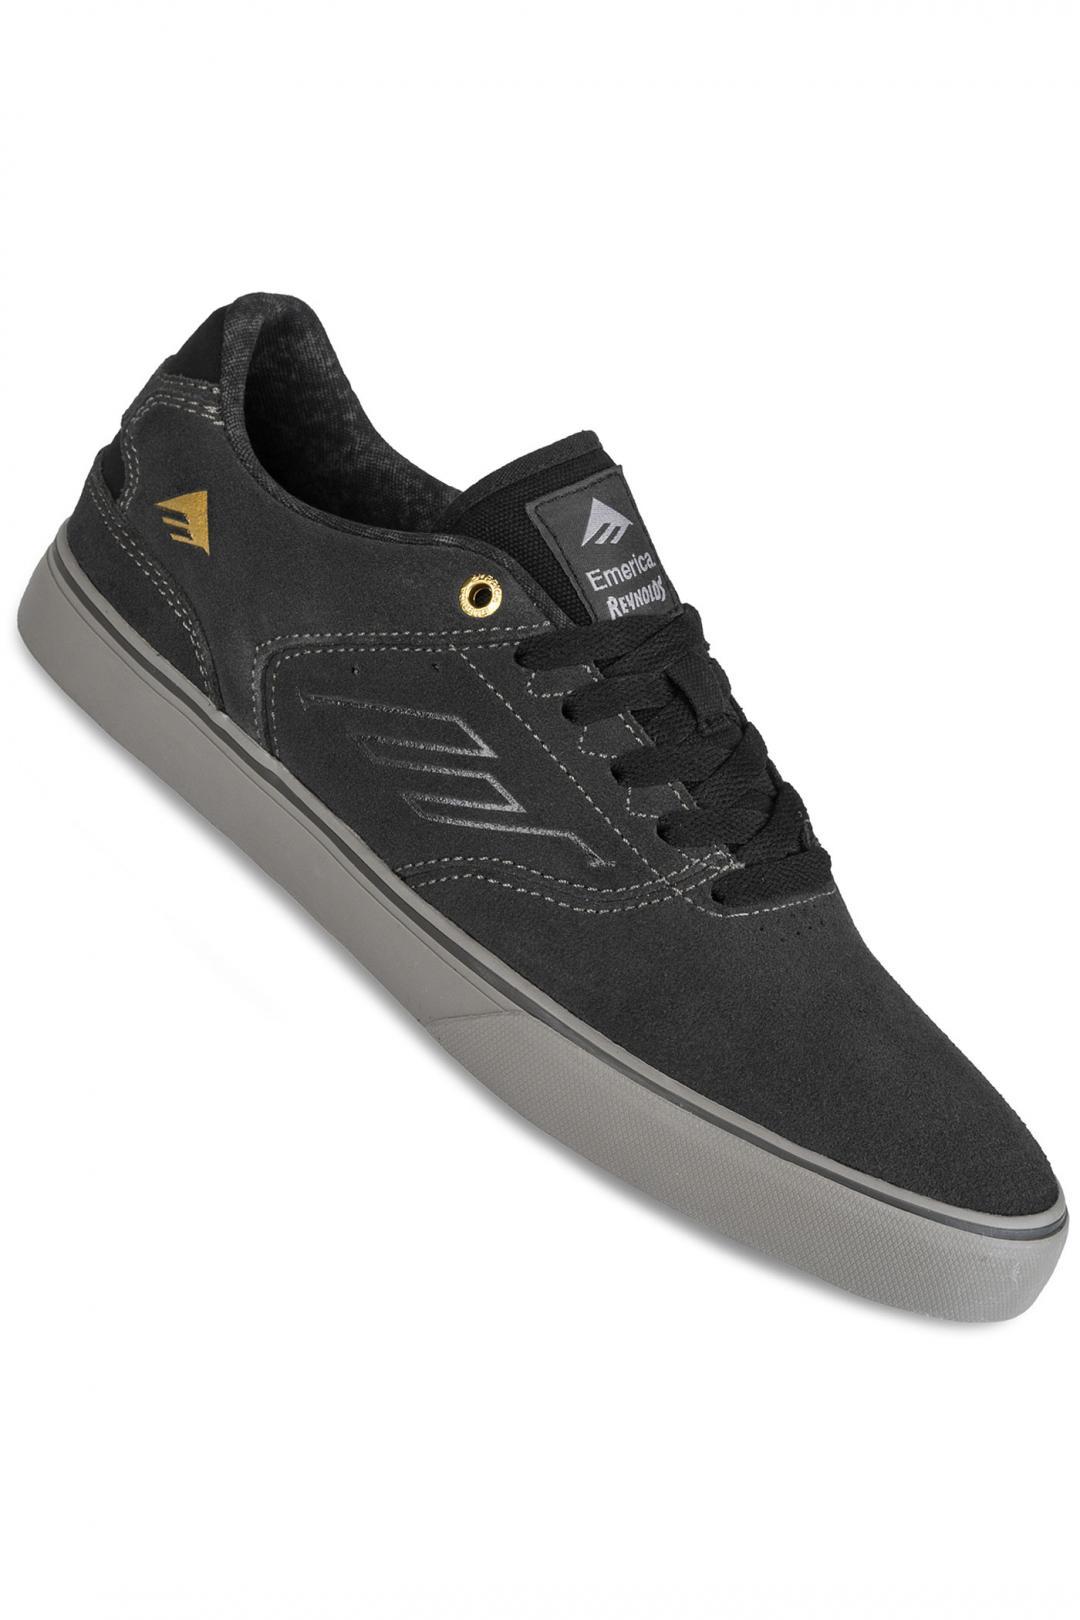 Uomo Emerica The Reynolds Low Vulc dark grey grey | Sneaker